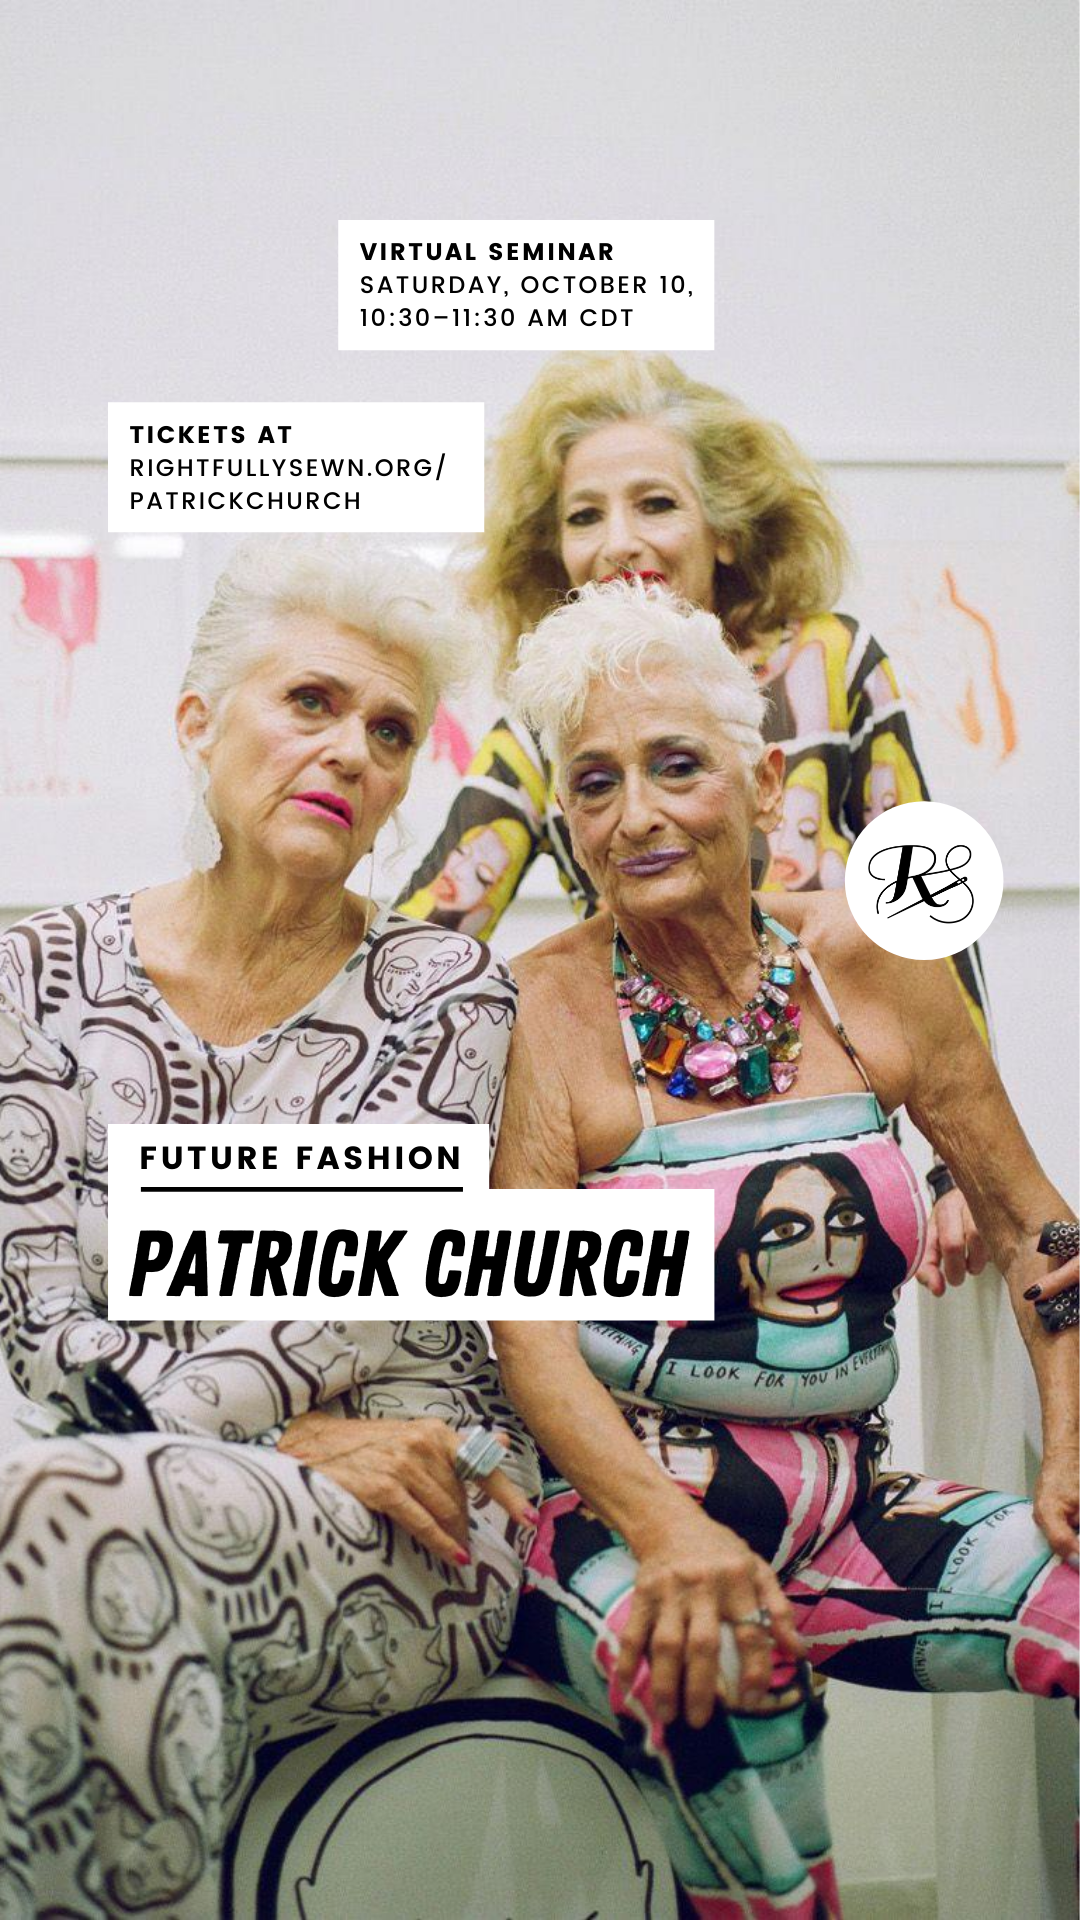 Ad for Future Fashion Patrick Church virtual seminar